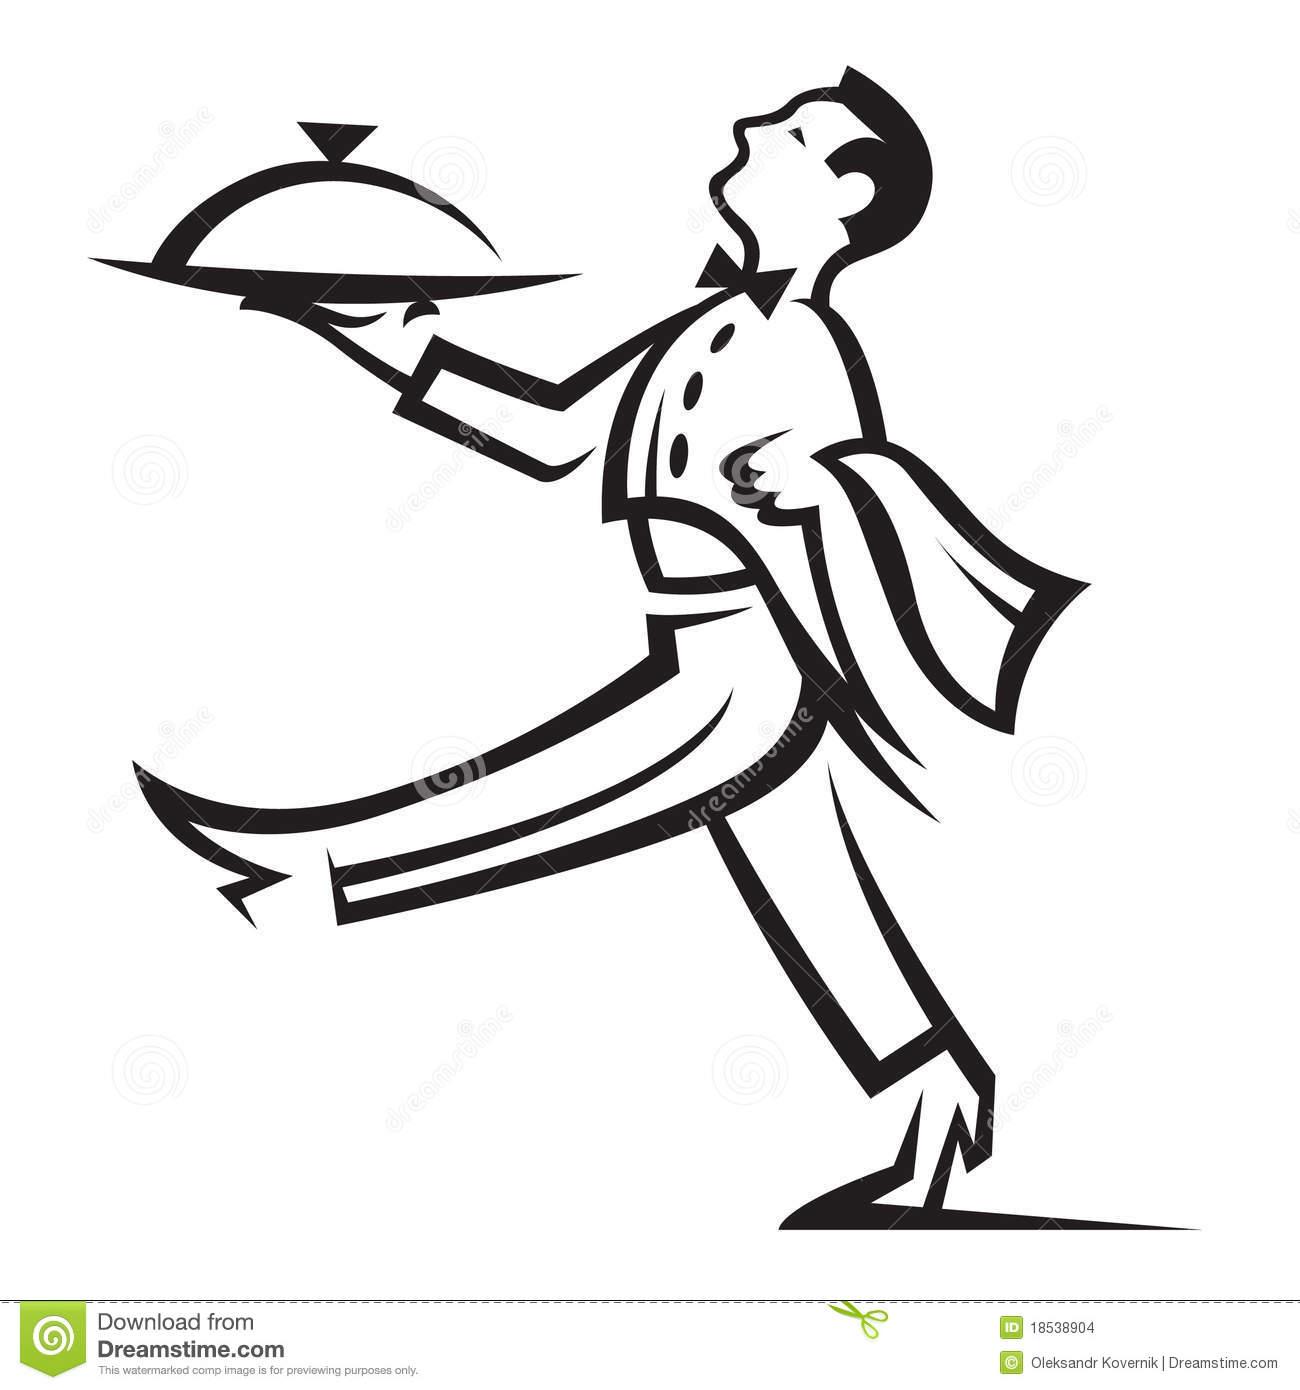 Gastronomie kellner clipart png transparent library Gastronomy Stock Illustrationen, Vektors, & Klipart – (13,323 ... png transparent library